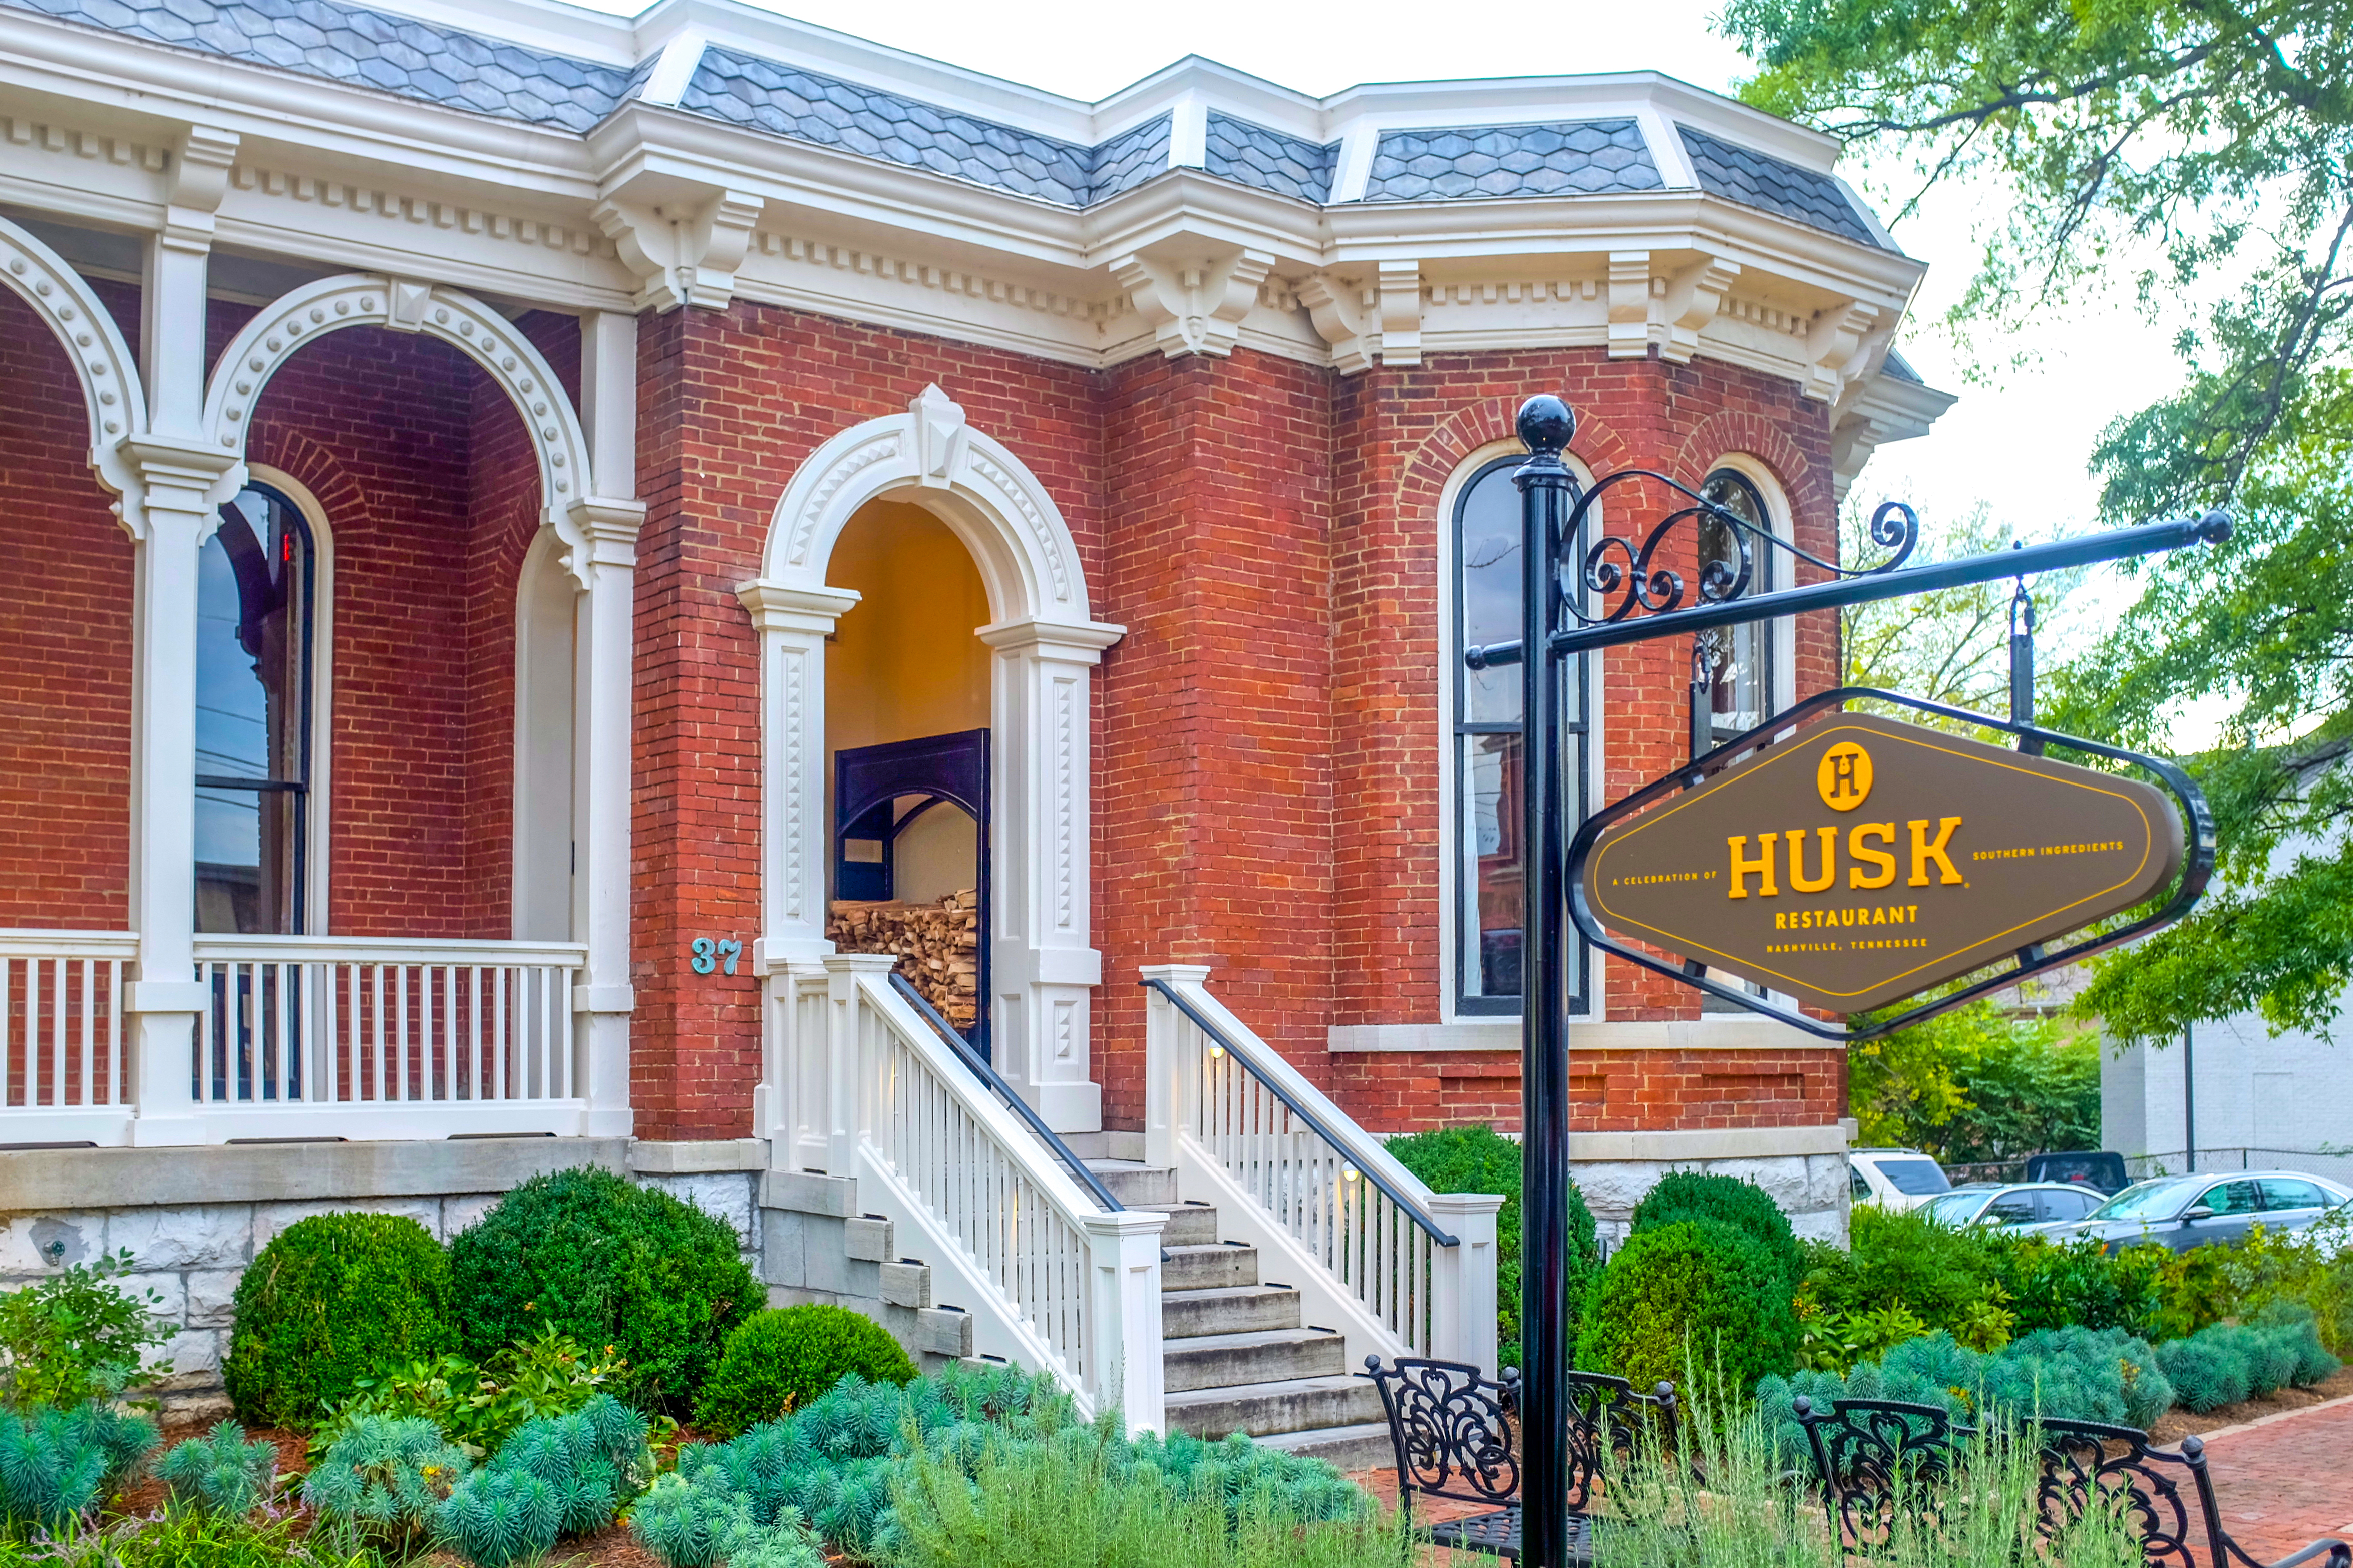 Exterior shot of Husk restaurant in Nashville